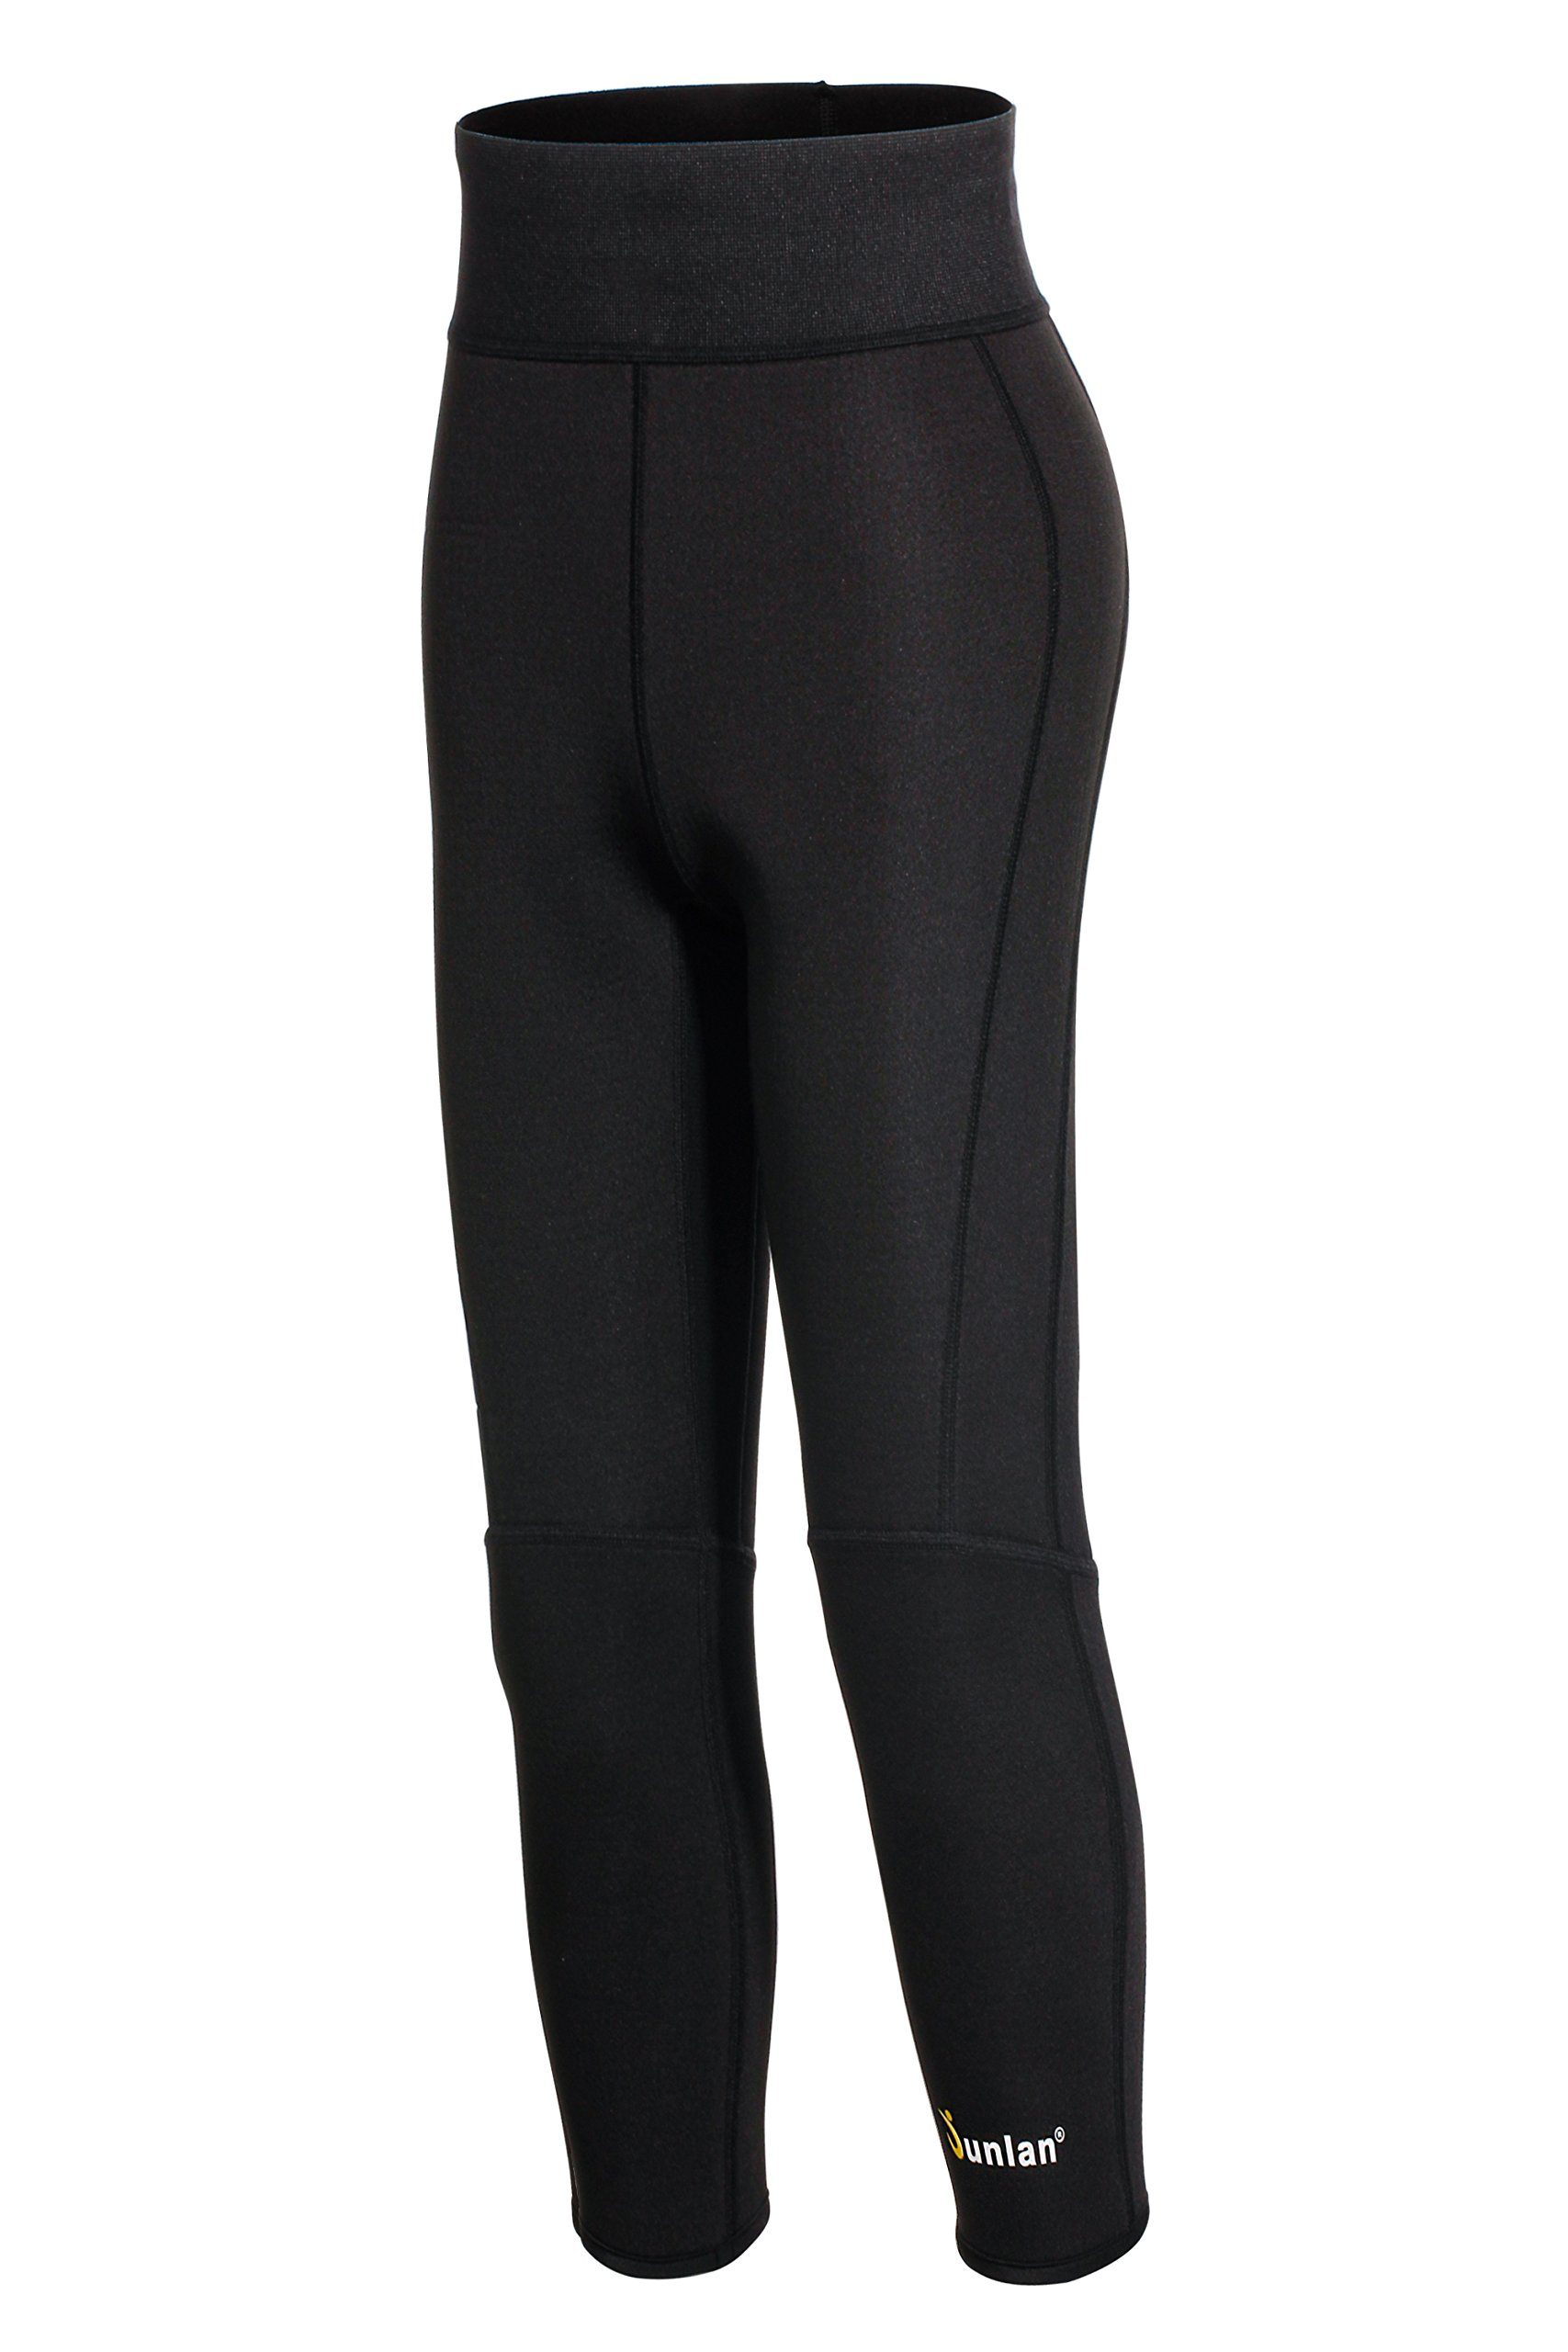 3f0d501dc1 Junlan Women Neoprene Workout Pants Body Shaper Sweat Sauna Suit for Weight  Loss Exercise Leggings Hot Slimming Yoga Capris   Sauna Suits   Sports ...